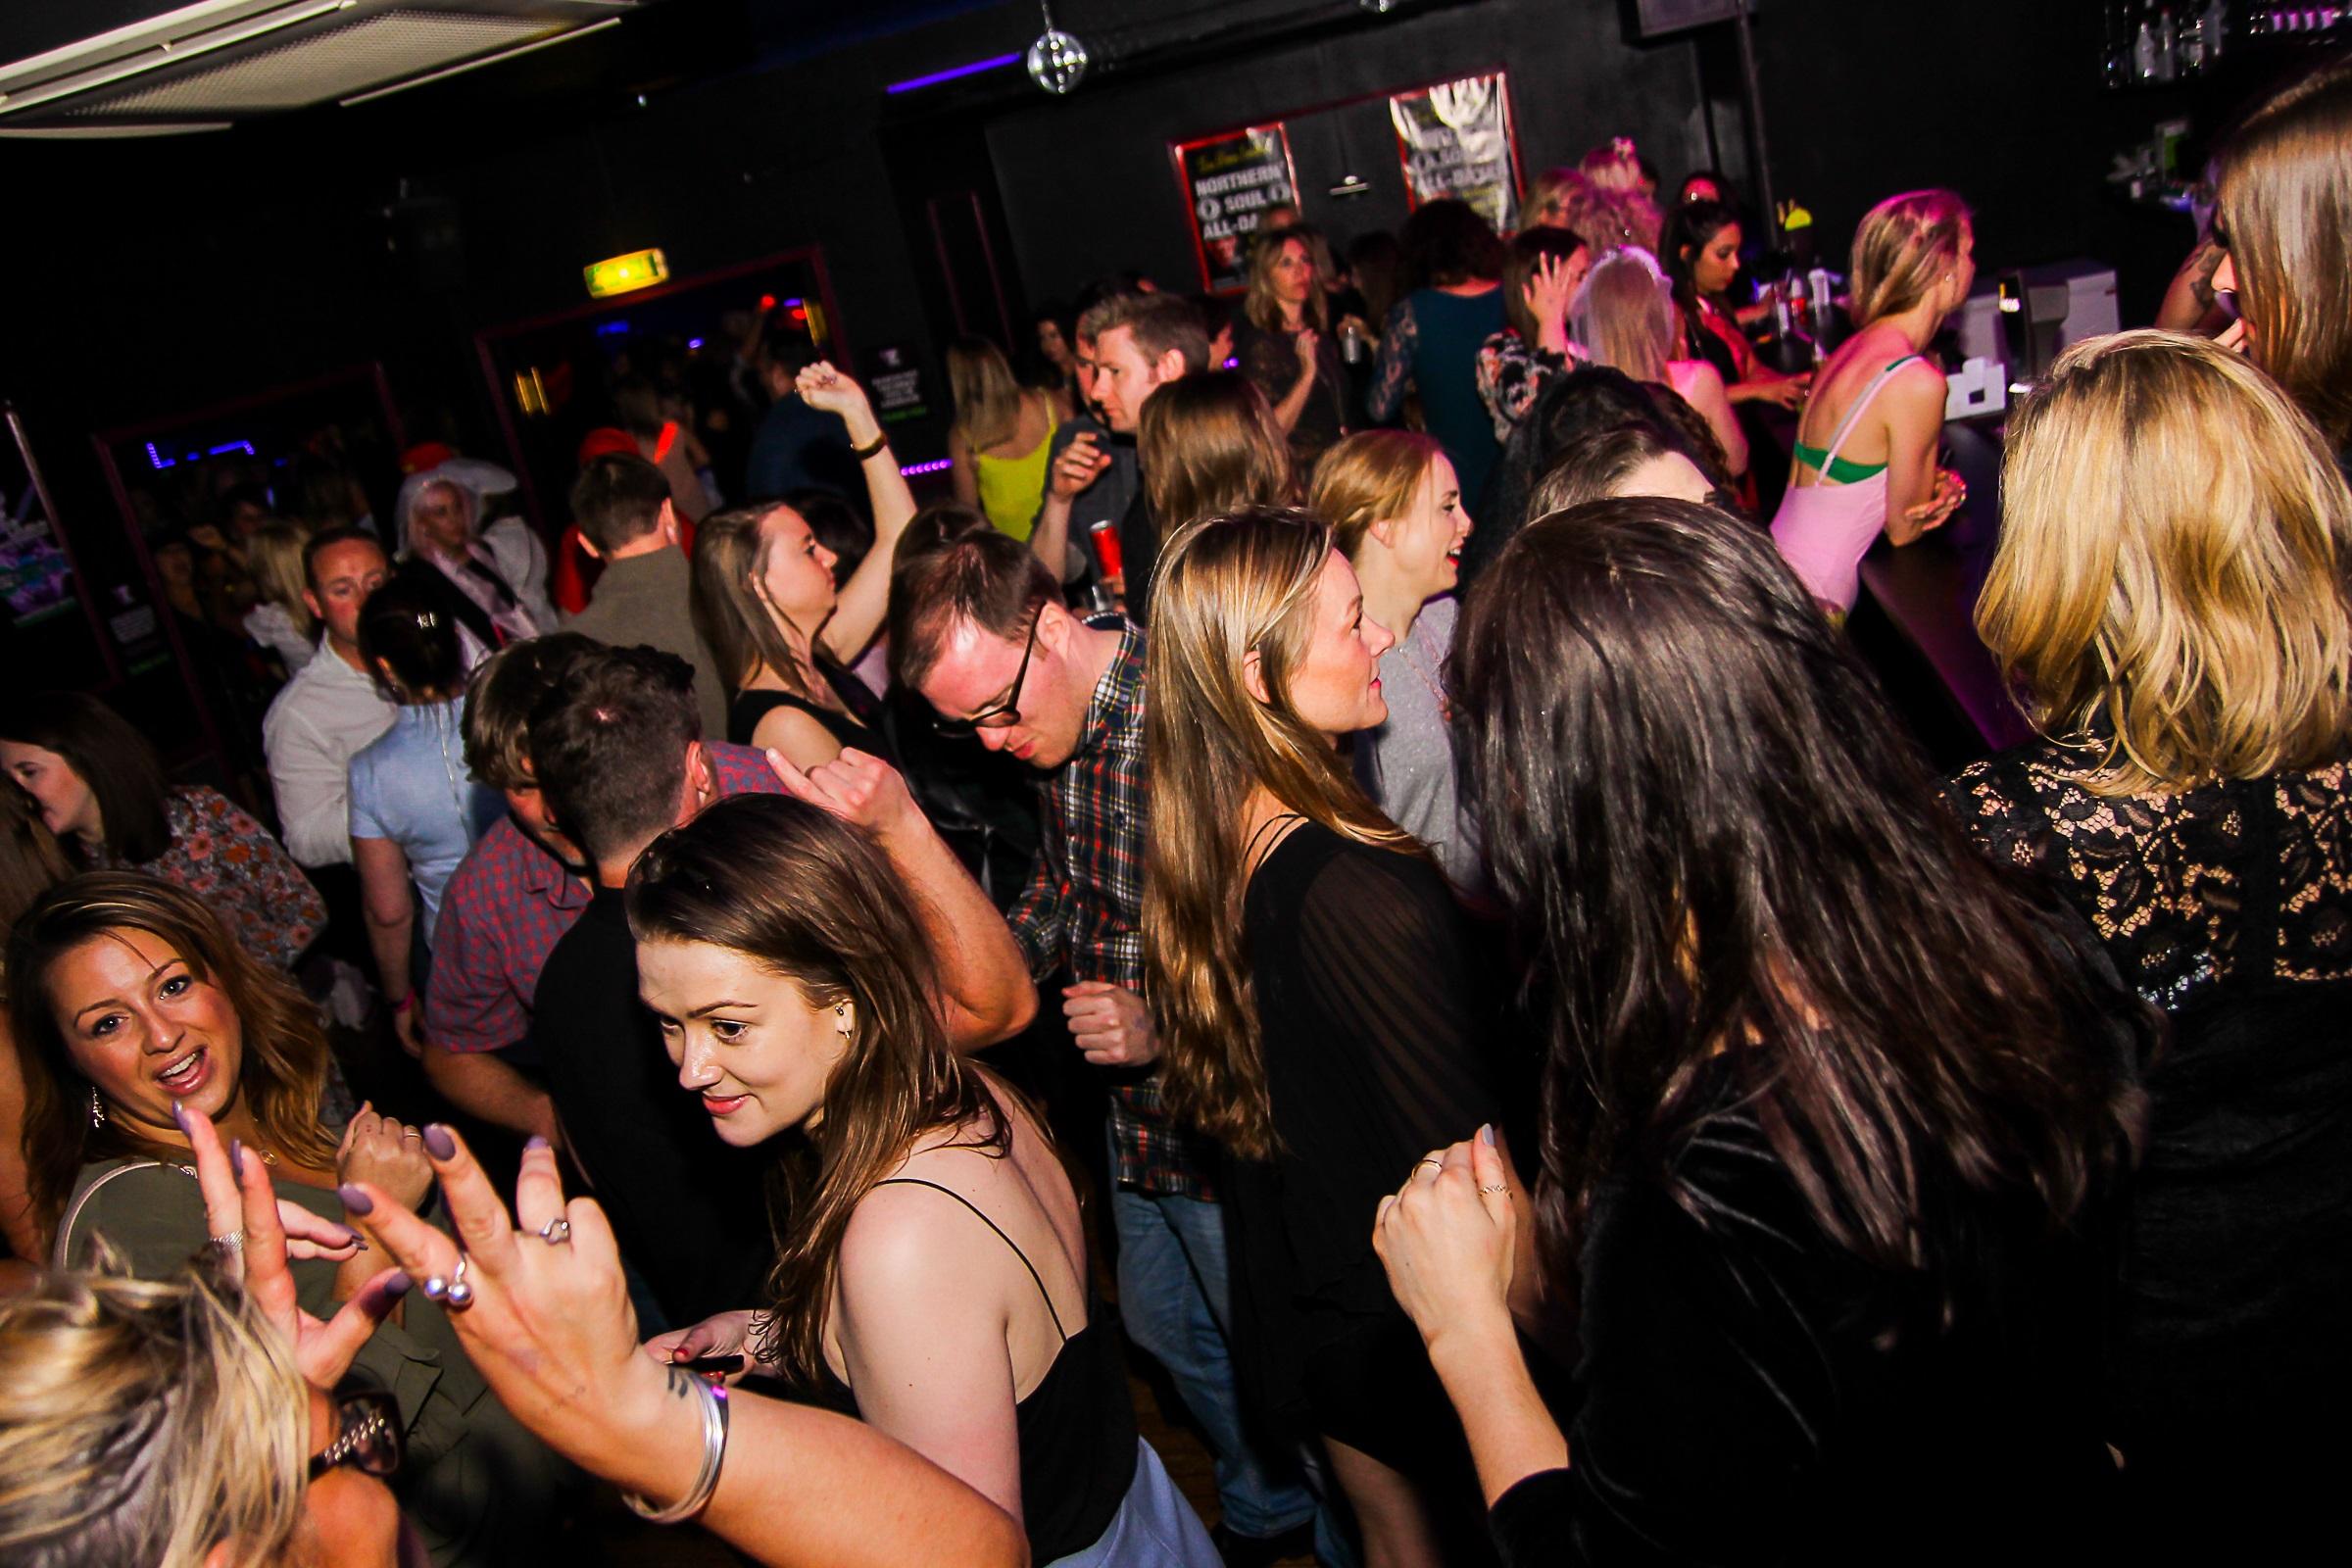 gay night clubs in brighton